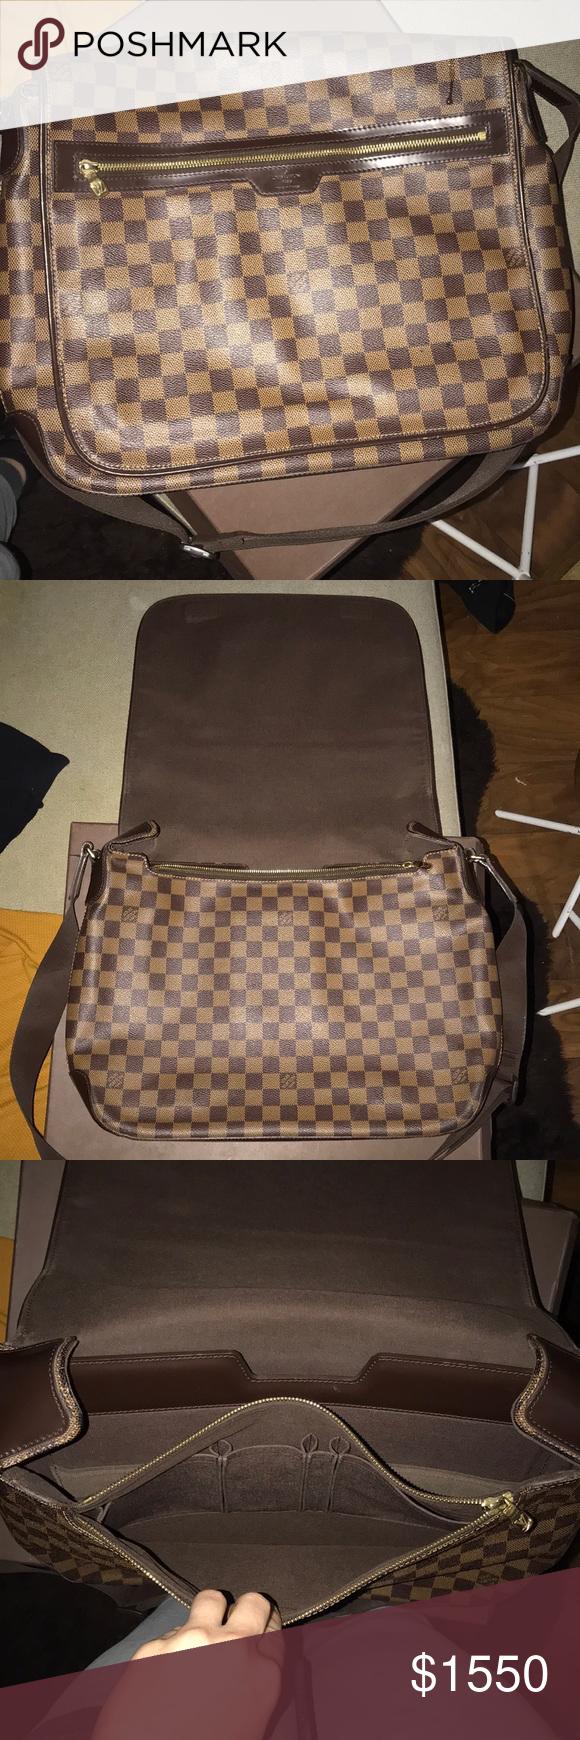 818654c370e6 Beautiful Louis Vuitton Beautiful Louis Vuitton computer bag 💼 Poshmark  authenticates all purchases over  500 so